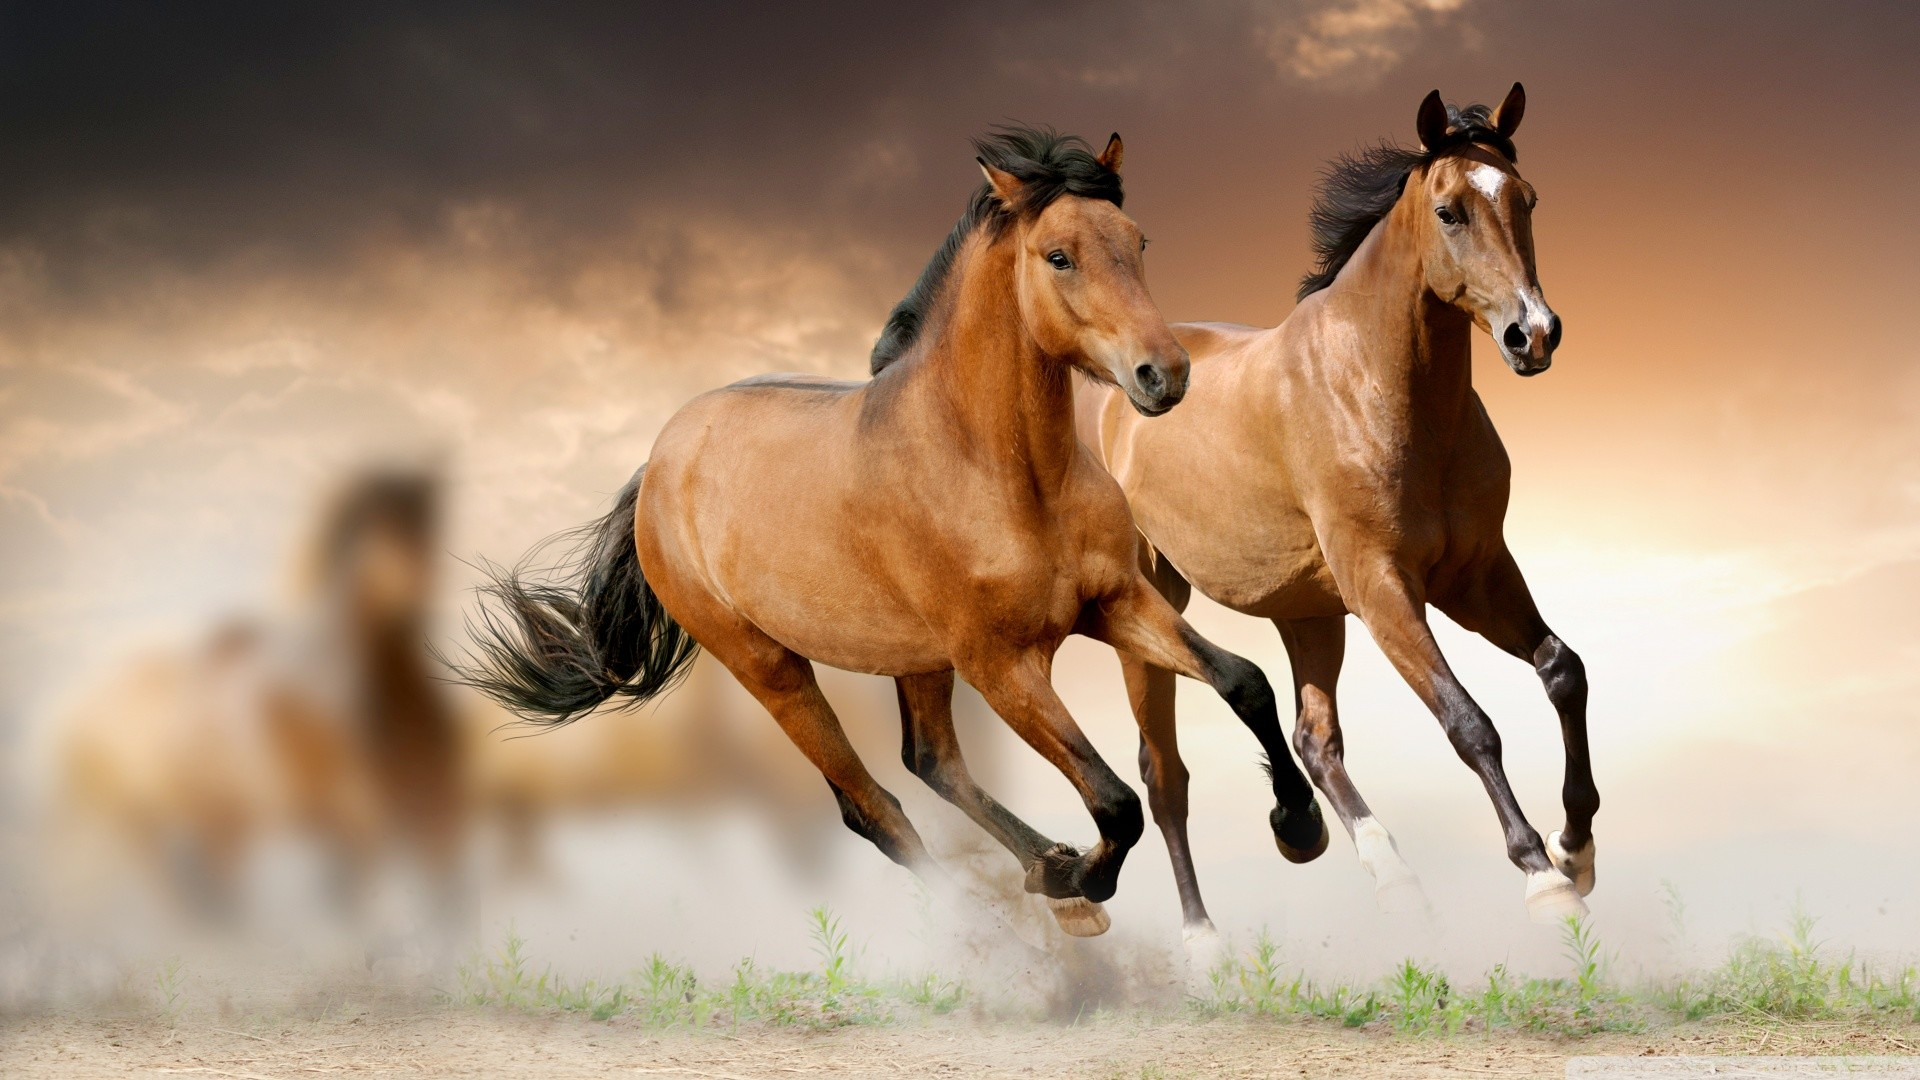 Horse Wallpapers | Best Wallpapers